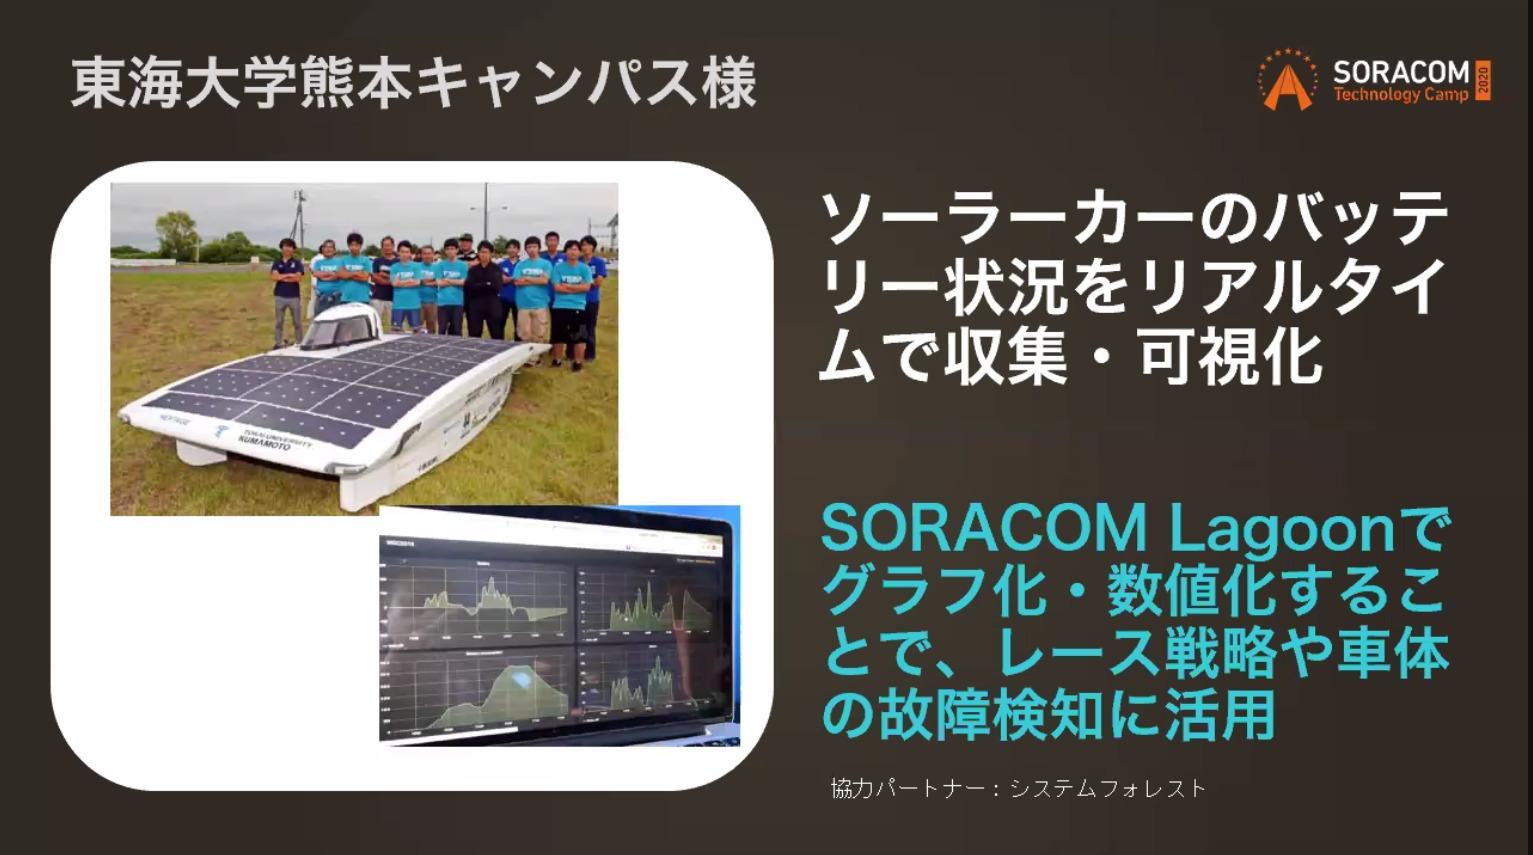 soracom-tech-camp-day1-visualization-11